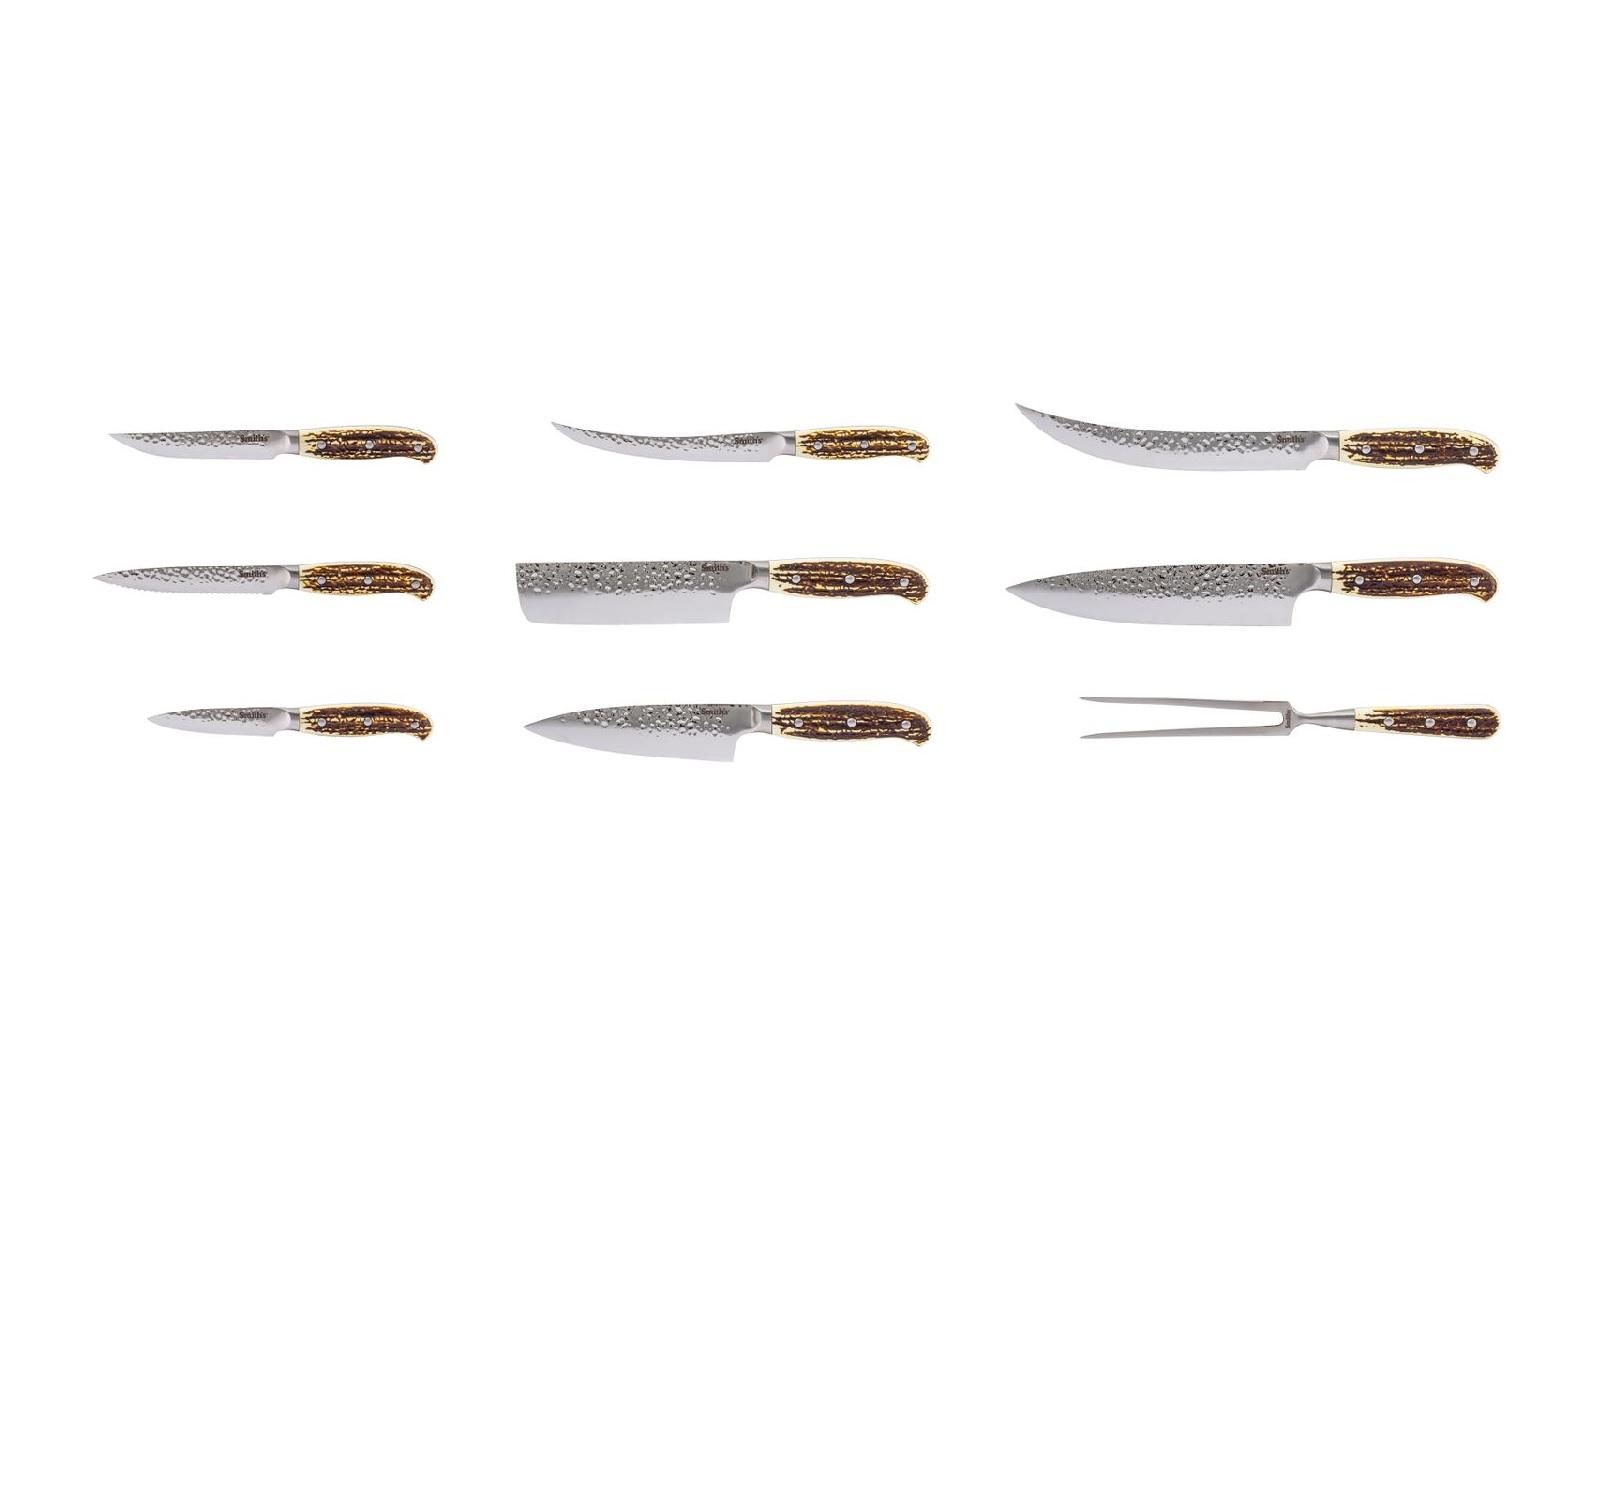 Smith Smith's Cabin & Lodge Cutlery 15-PCS Block Set